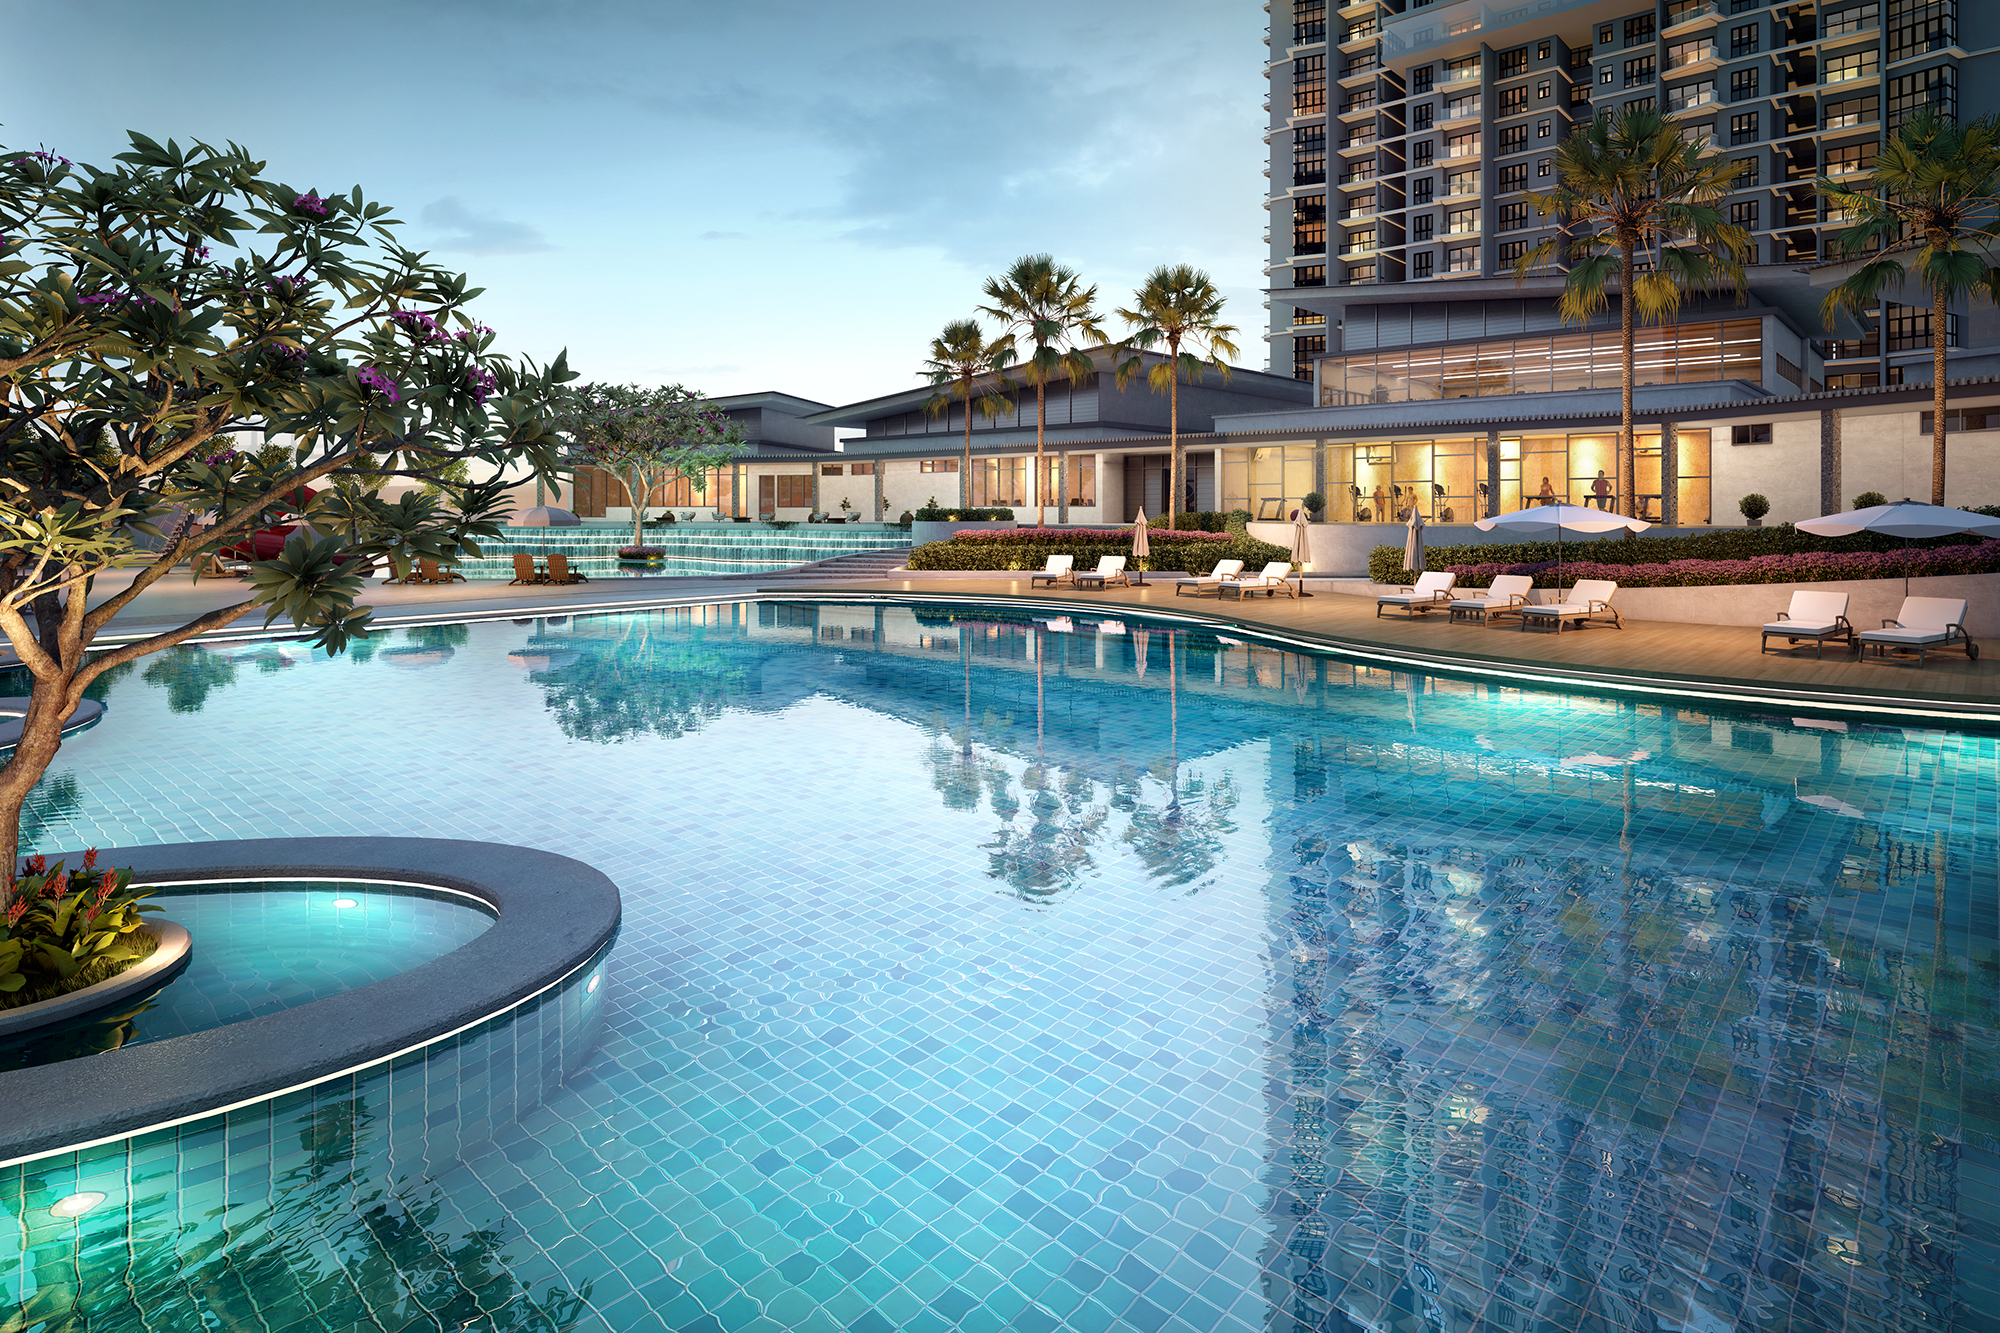 Sky condominium propwall malaysia - Swimming pool specialist malaysia ...